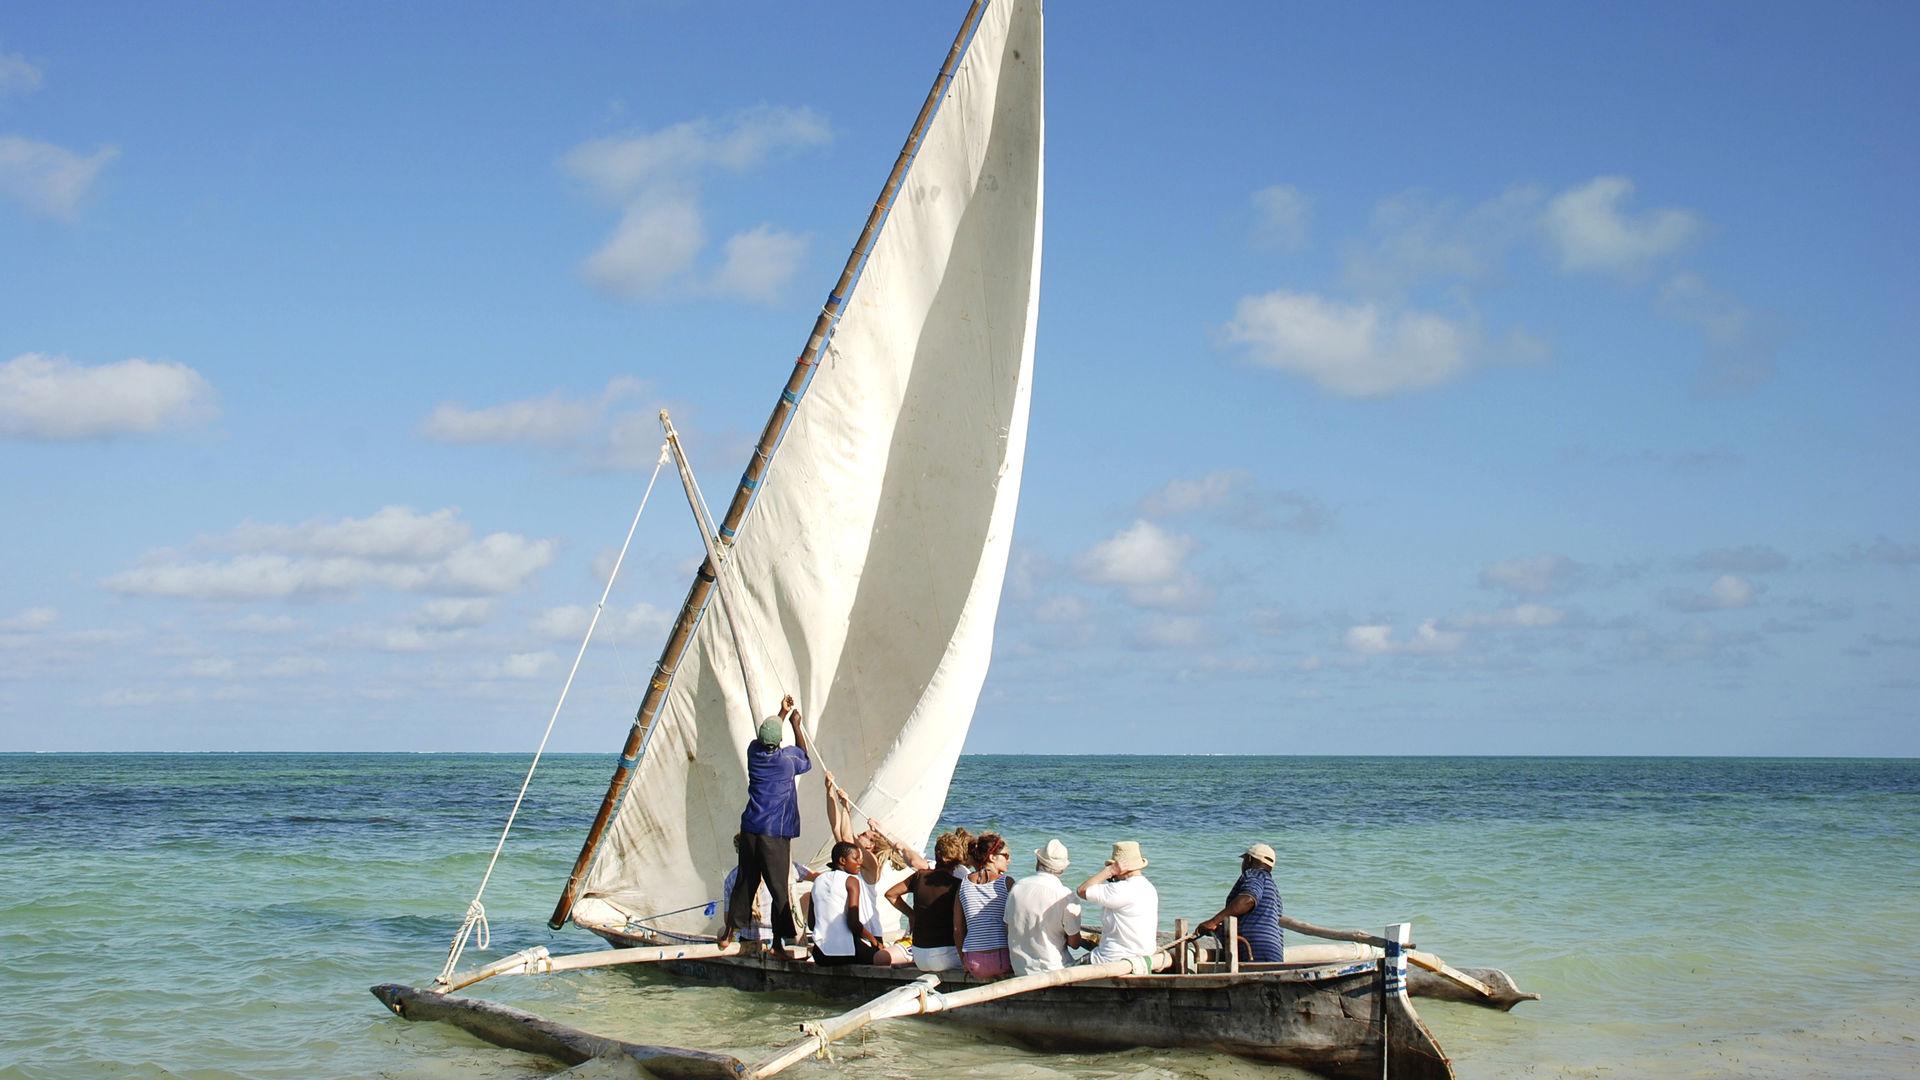 Privéreis Kenia Zanzibar safari strand - 15 dagen|Matoke Tours